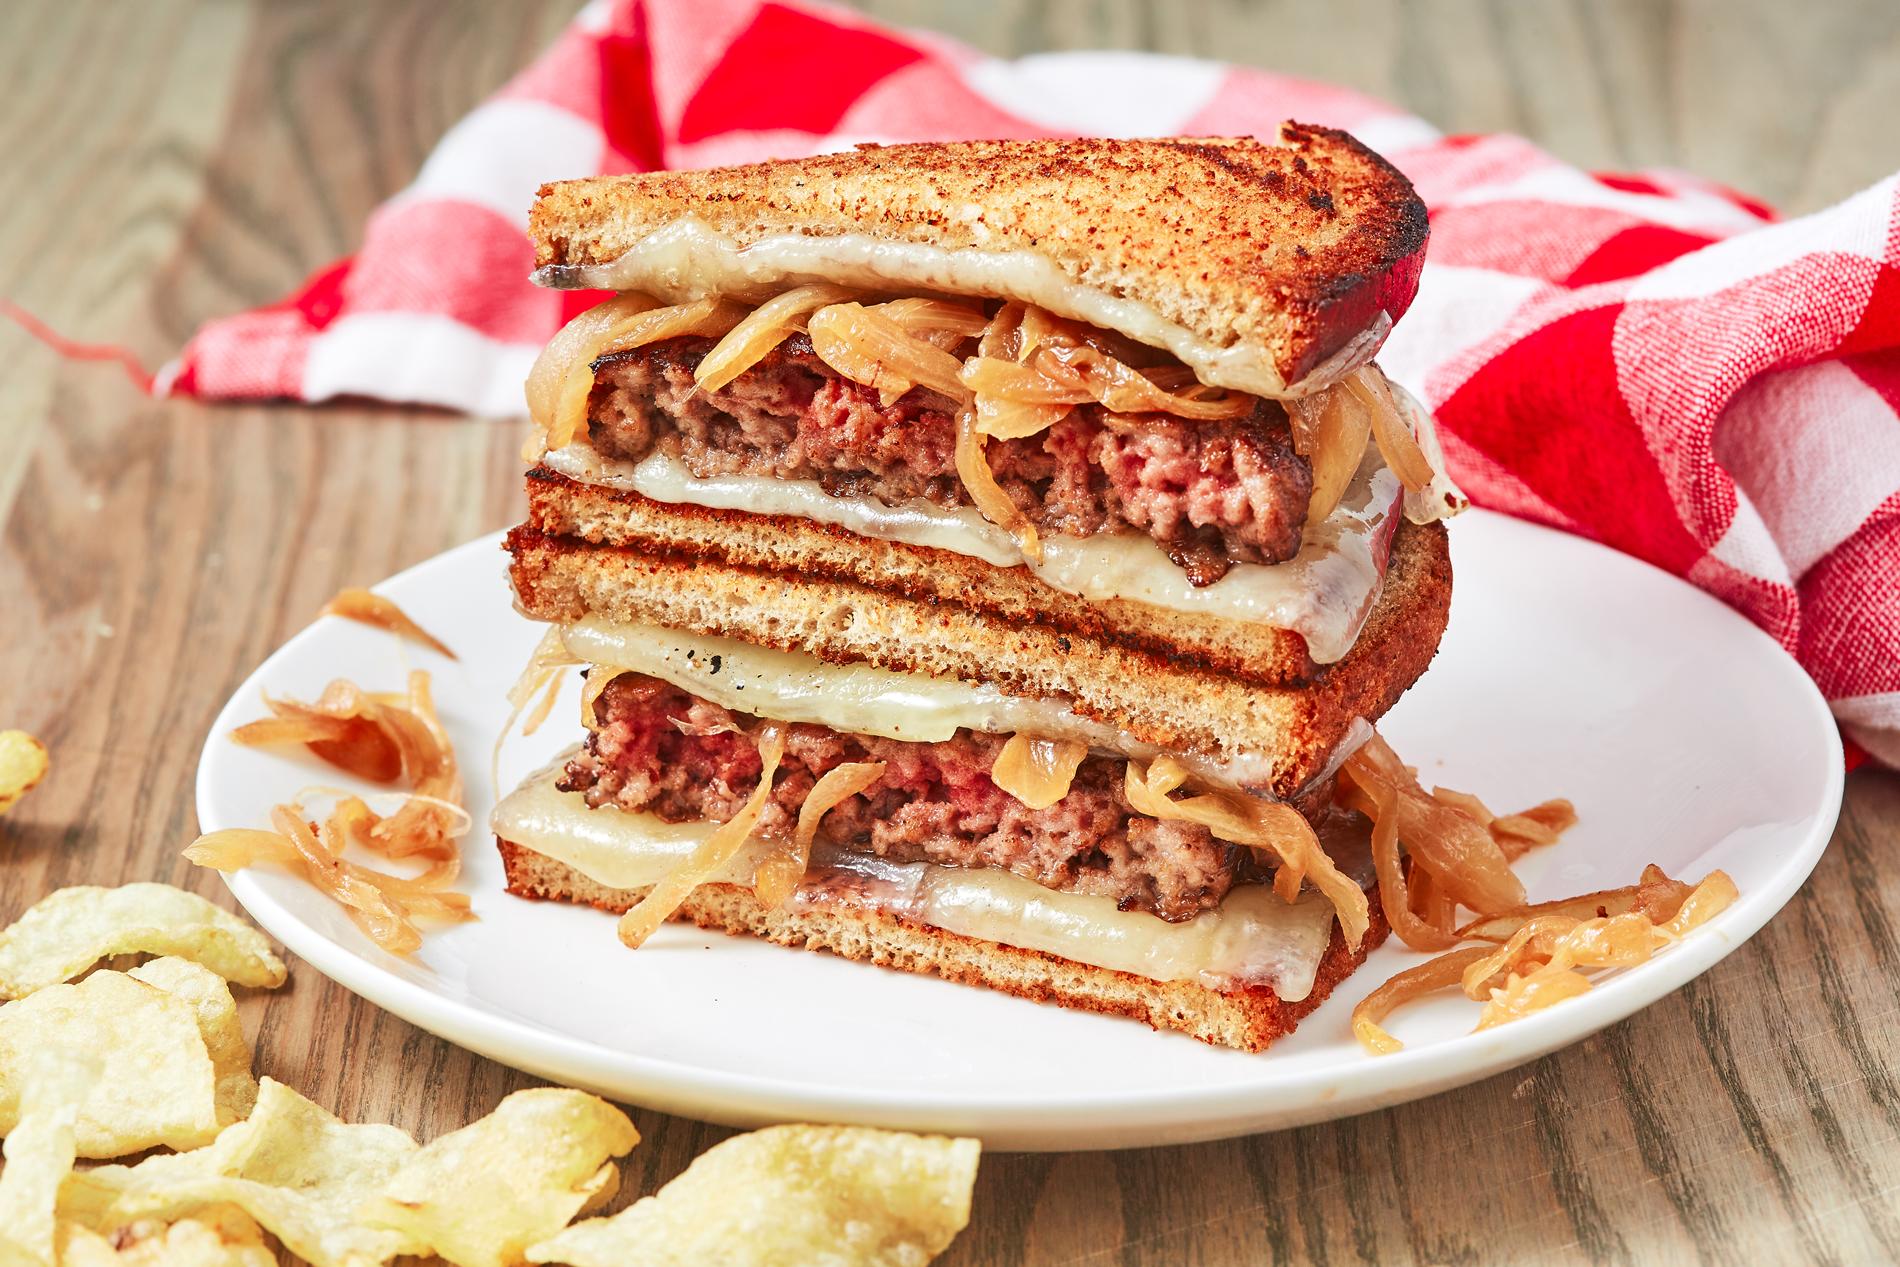 Best Patty Melt Recipe - How to Make Patty Melts